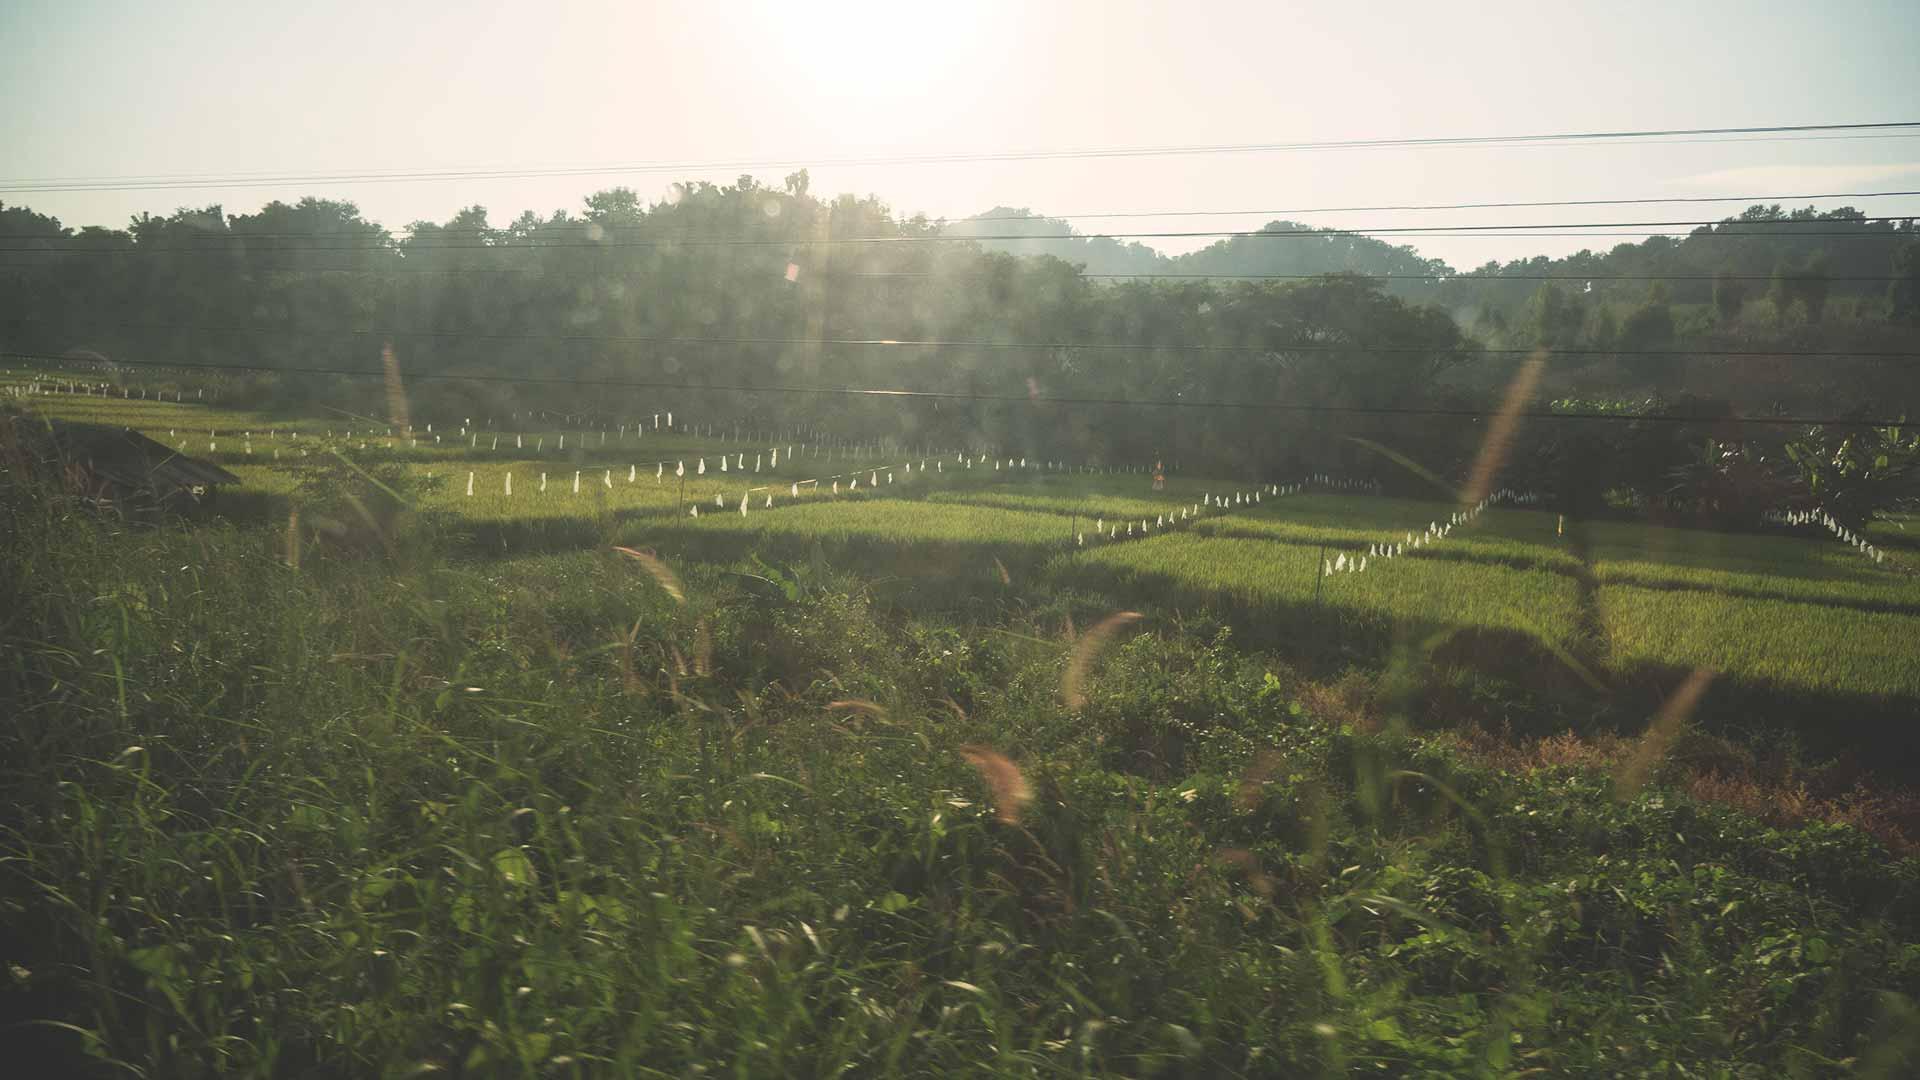 Thailand Landschaft - Zug von Bangkok nach Chiang Mai